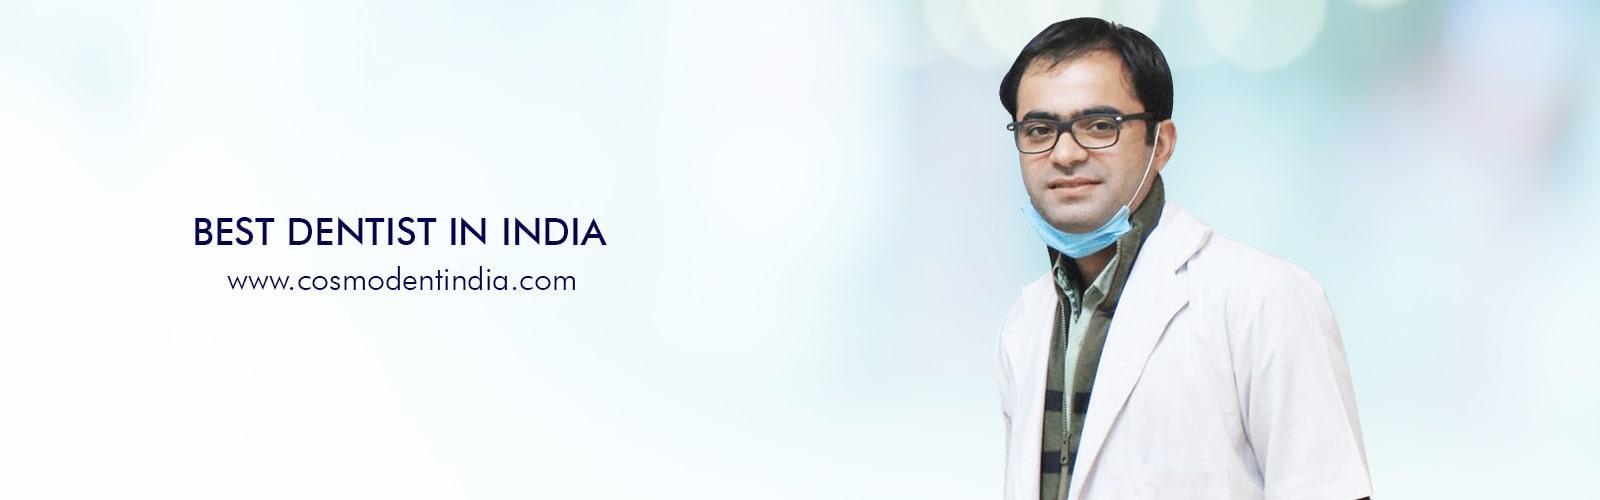 meilleur dentiste en Inde